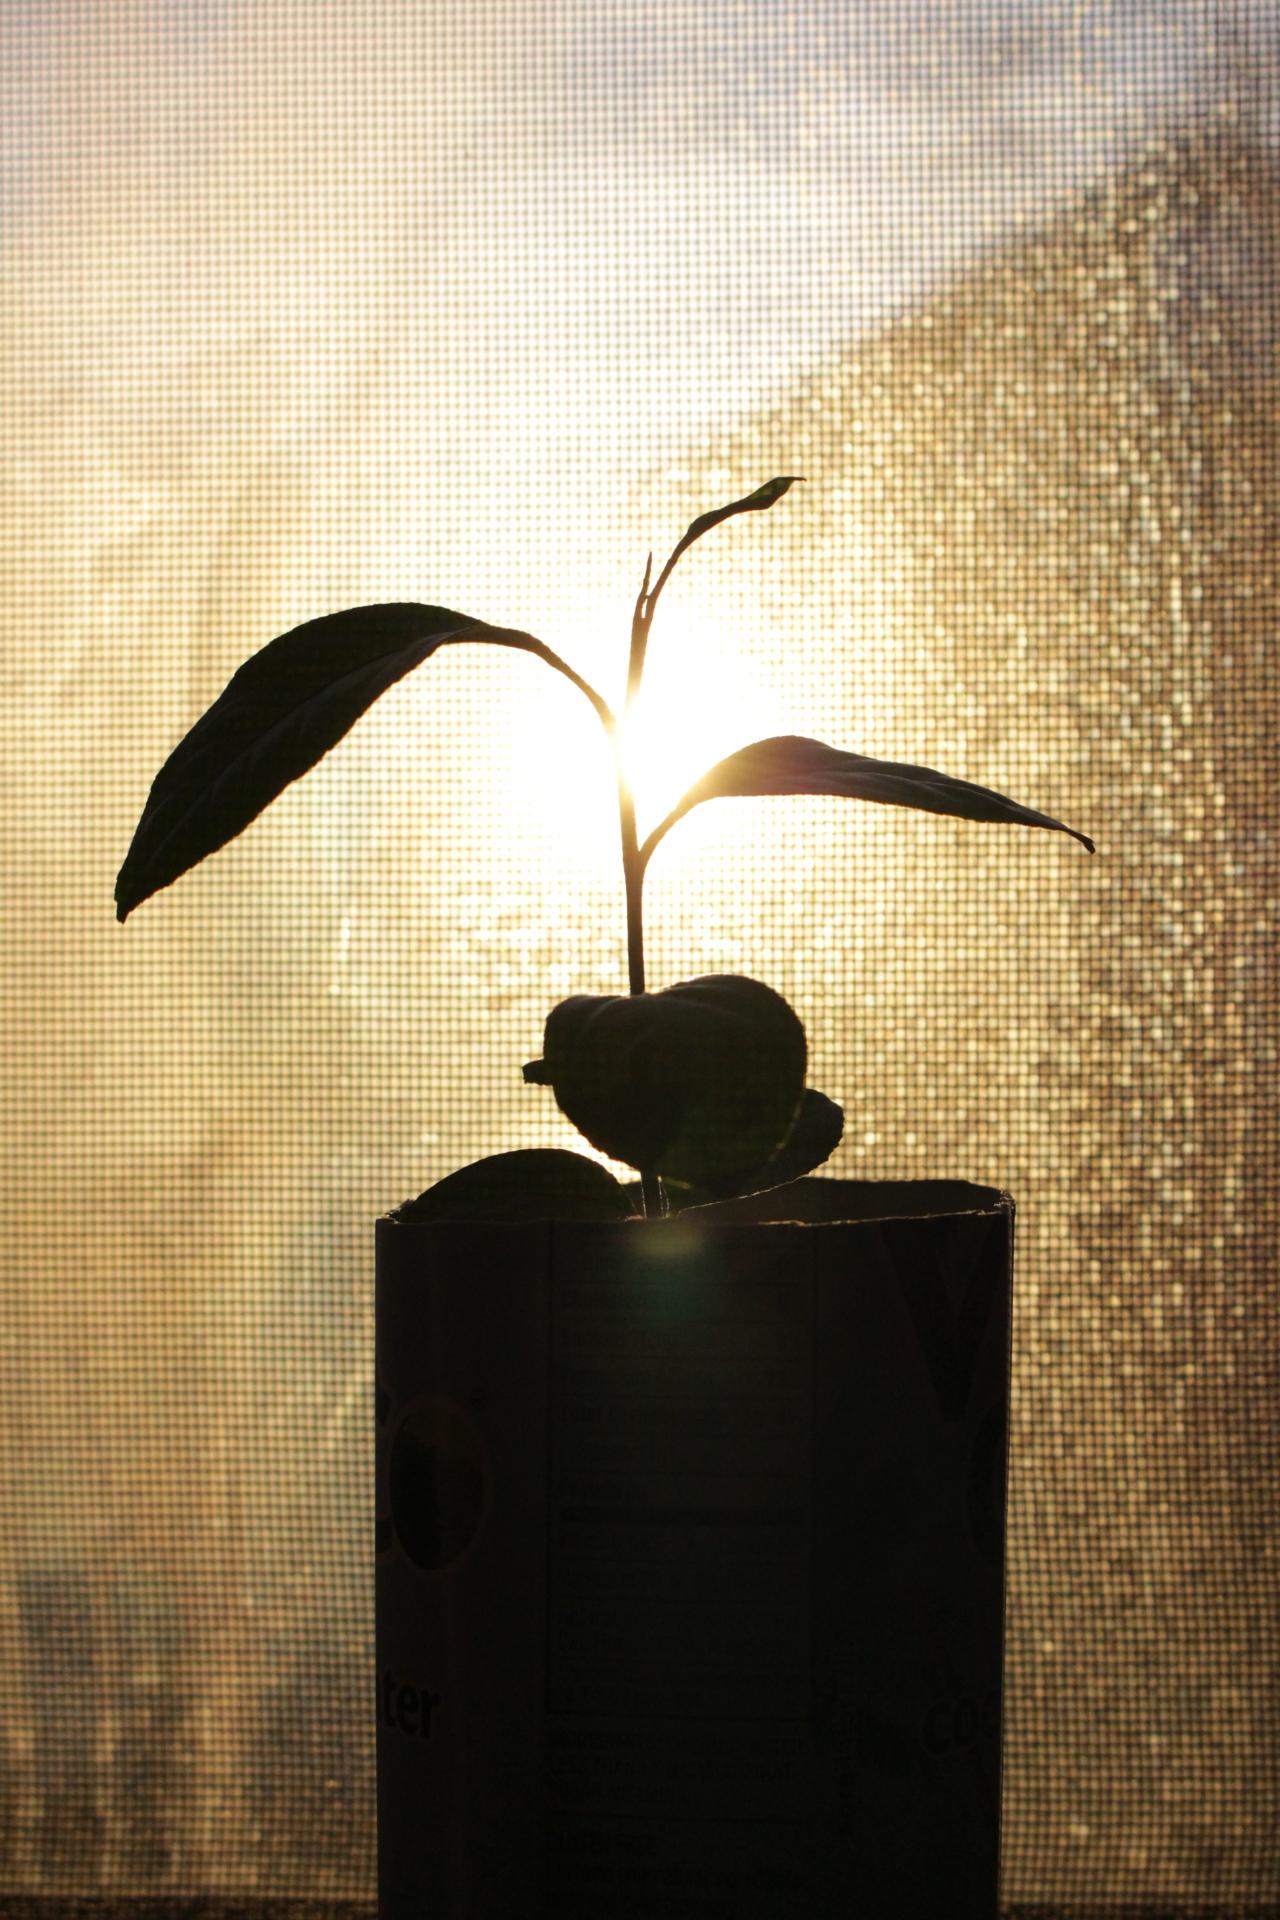 My Lemon plant